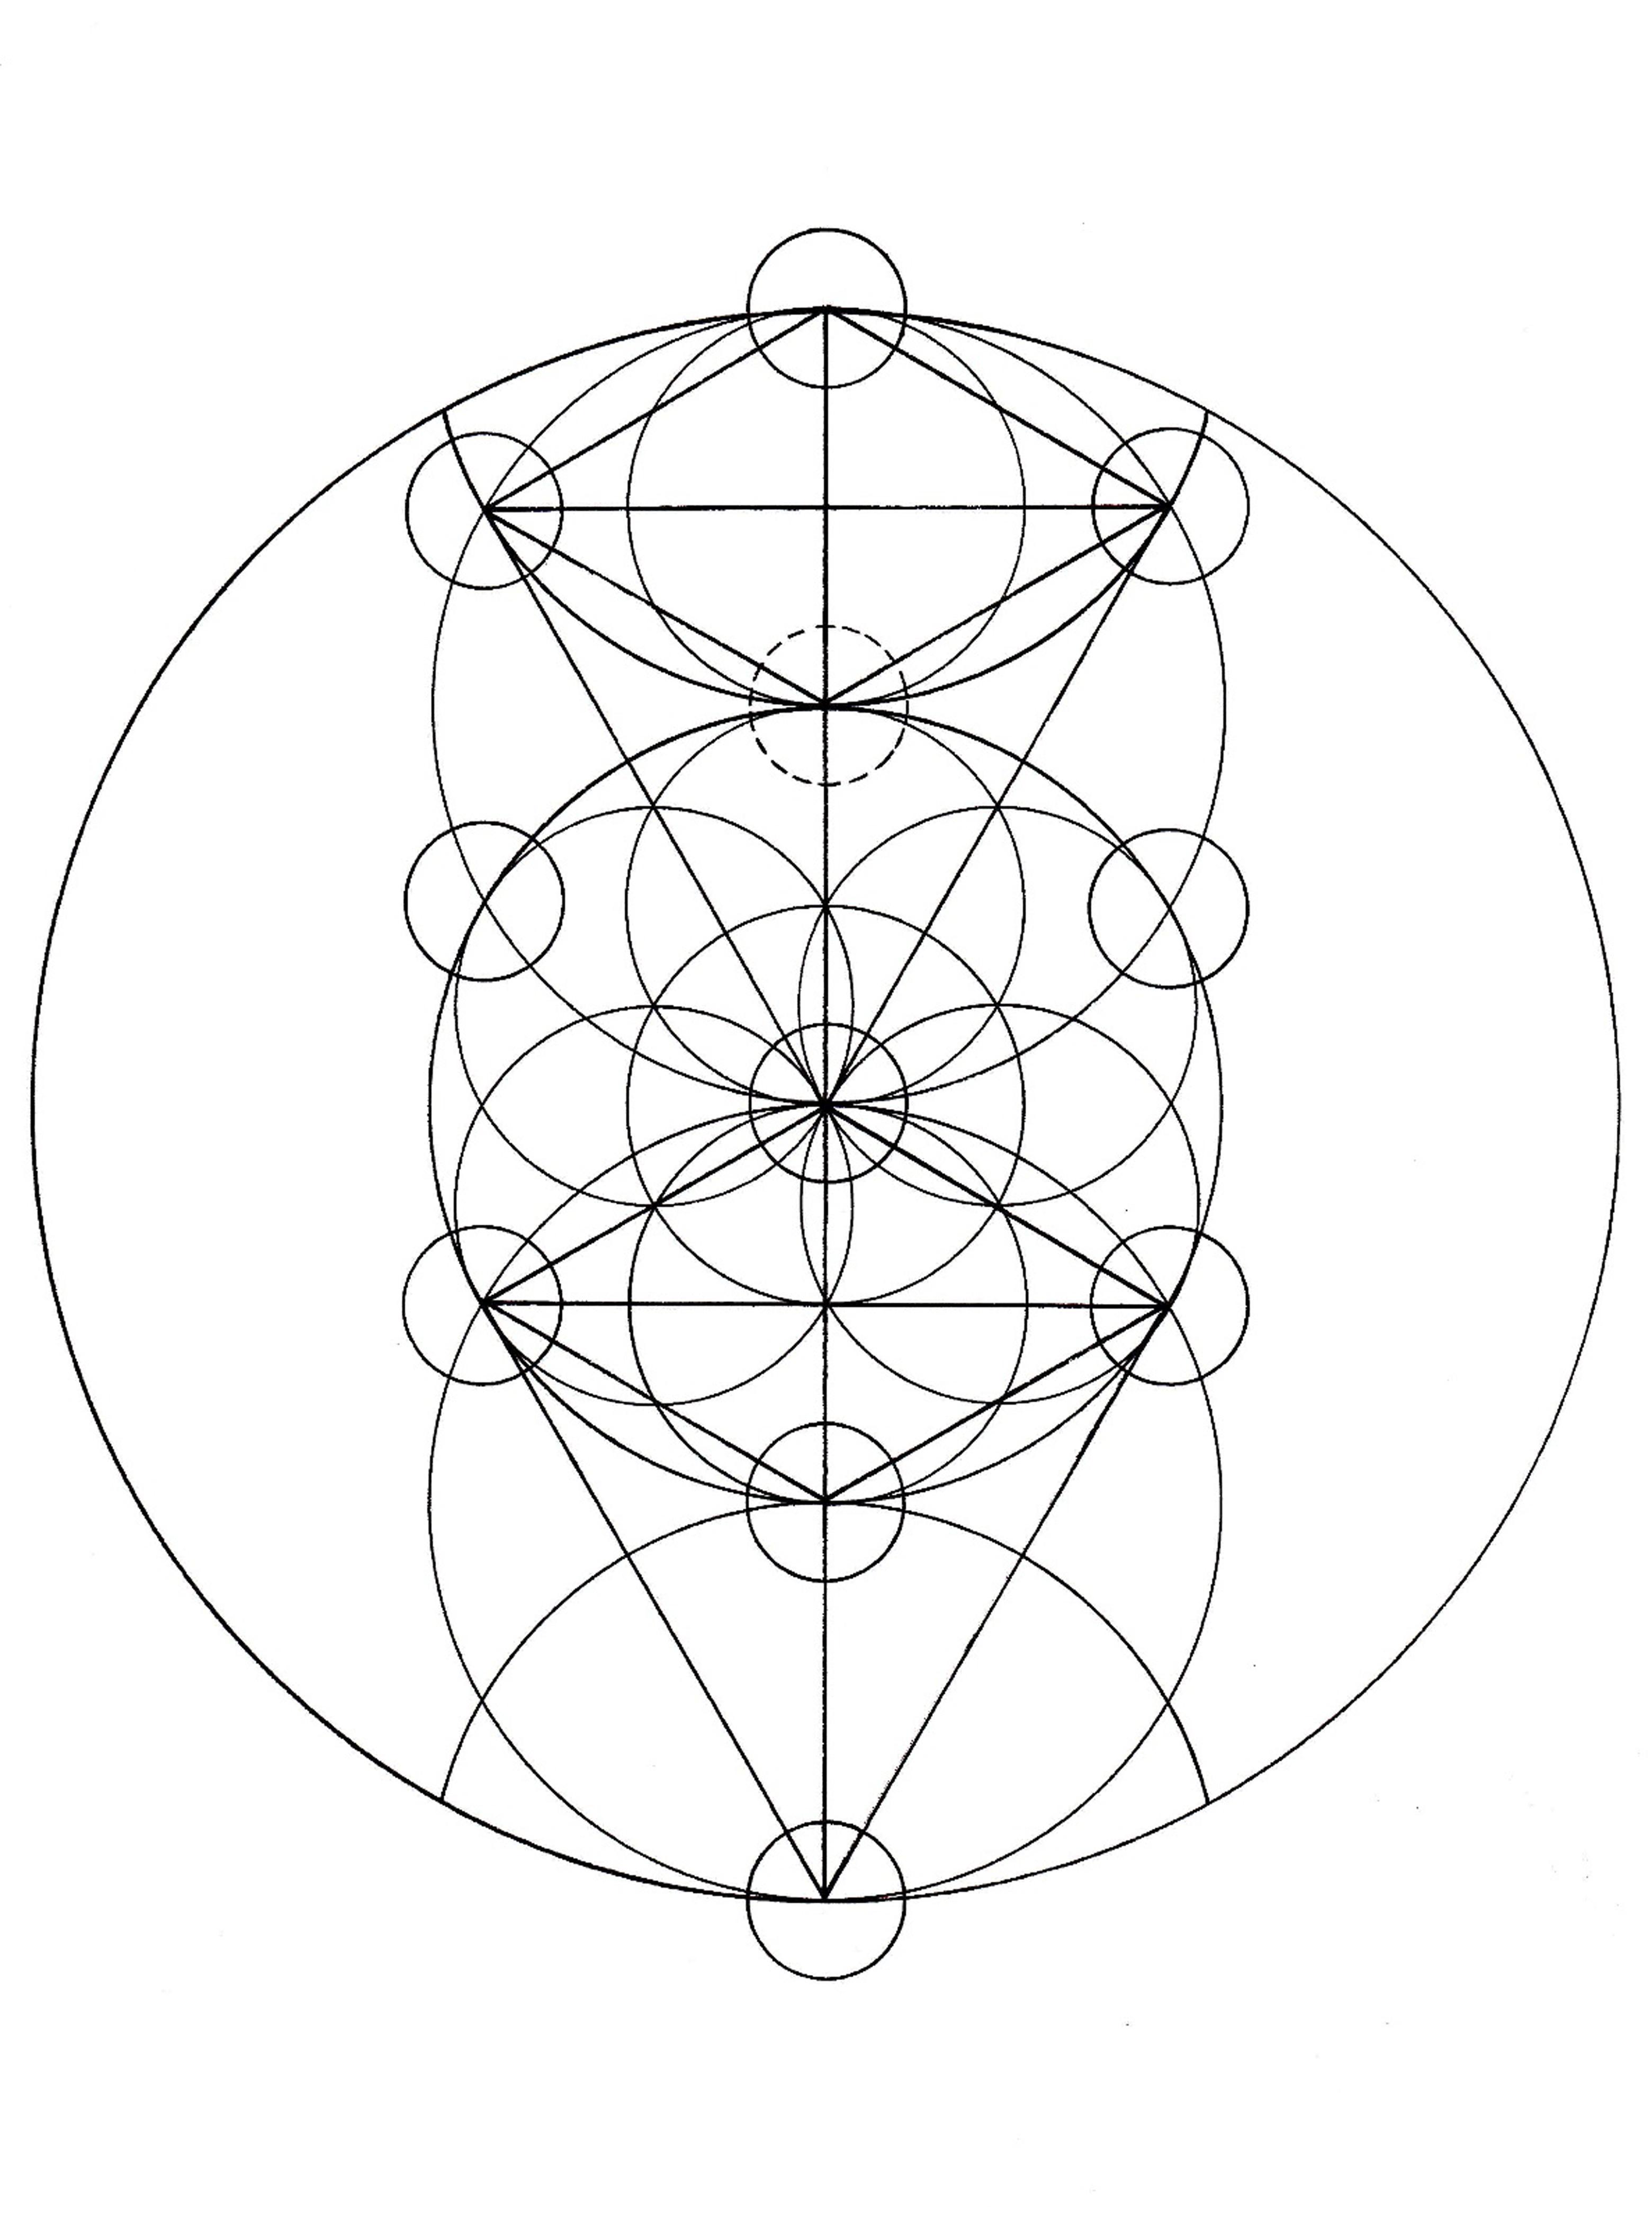 Geometric Life Drawing The Tree of Life